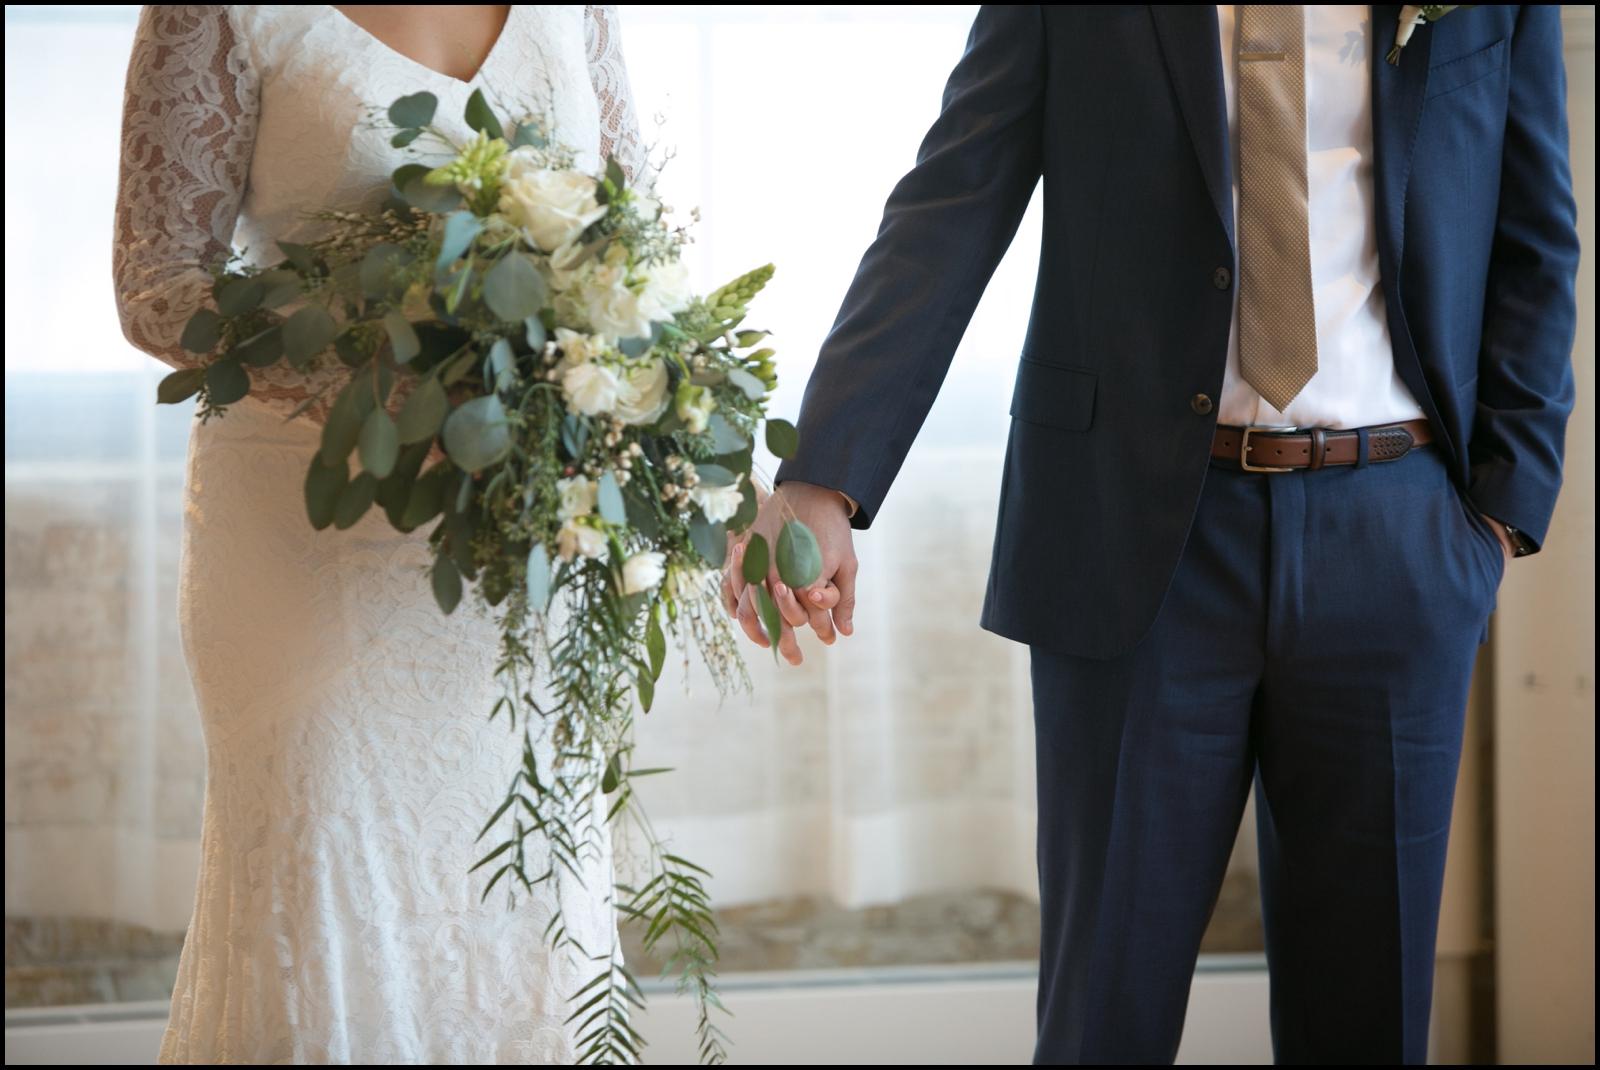 Machine Shop Mpls. Minnesota Wedding Planner_1036.jpg